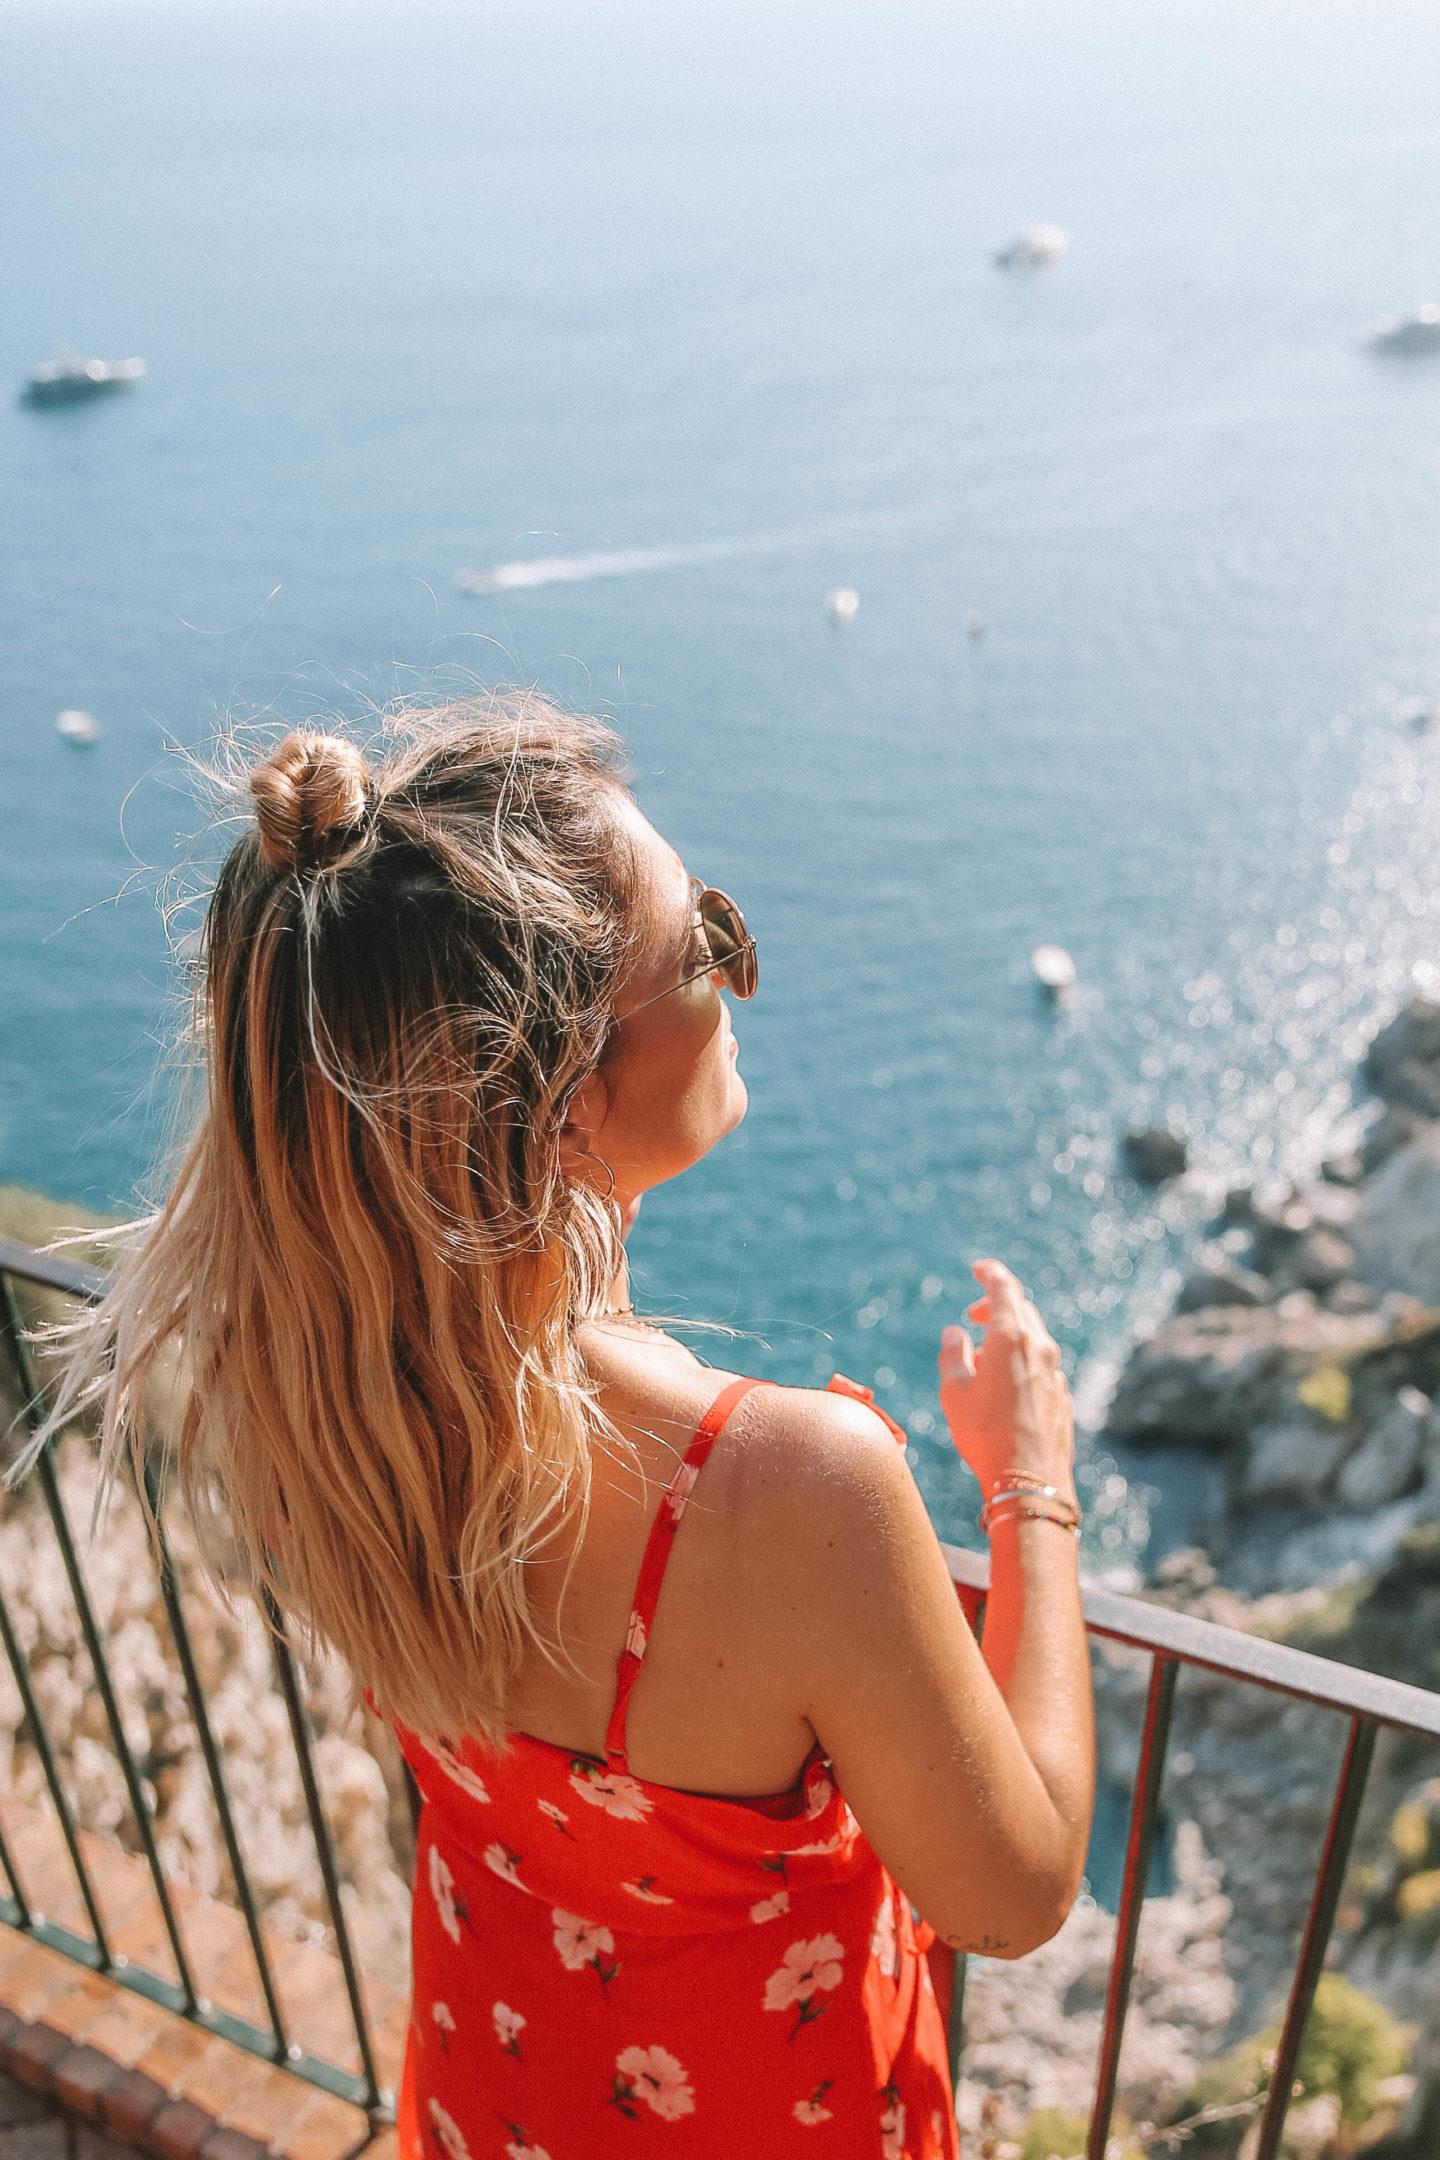 Visiter Capri - Blondie baby blog mode et voyages